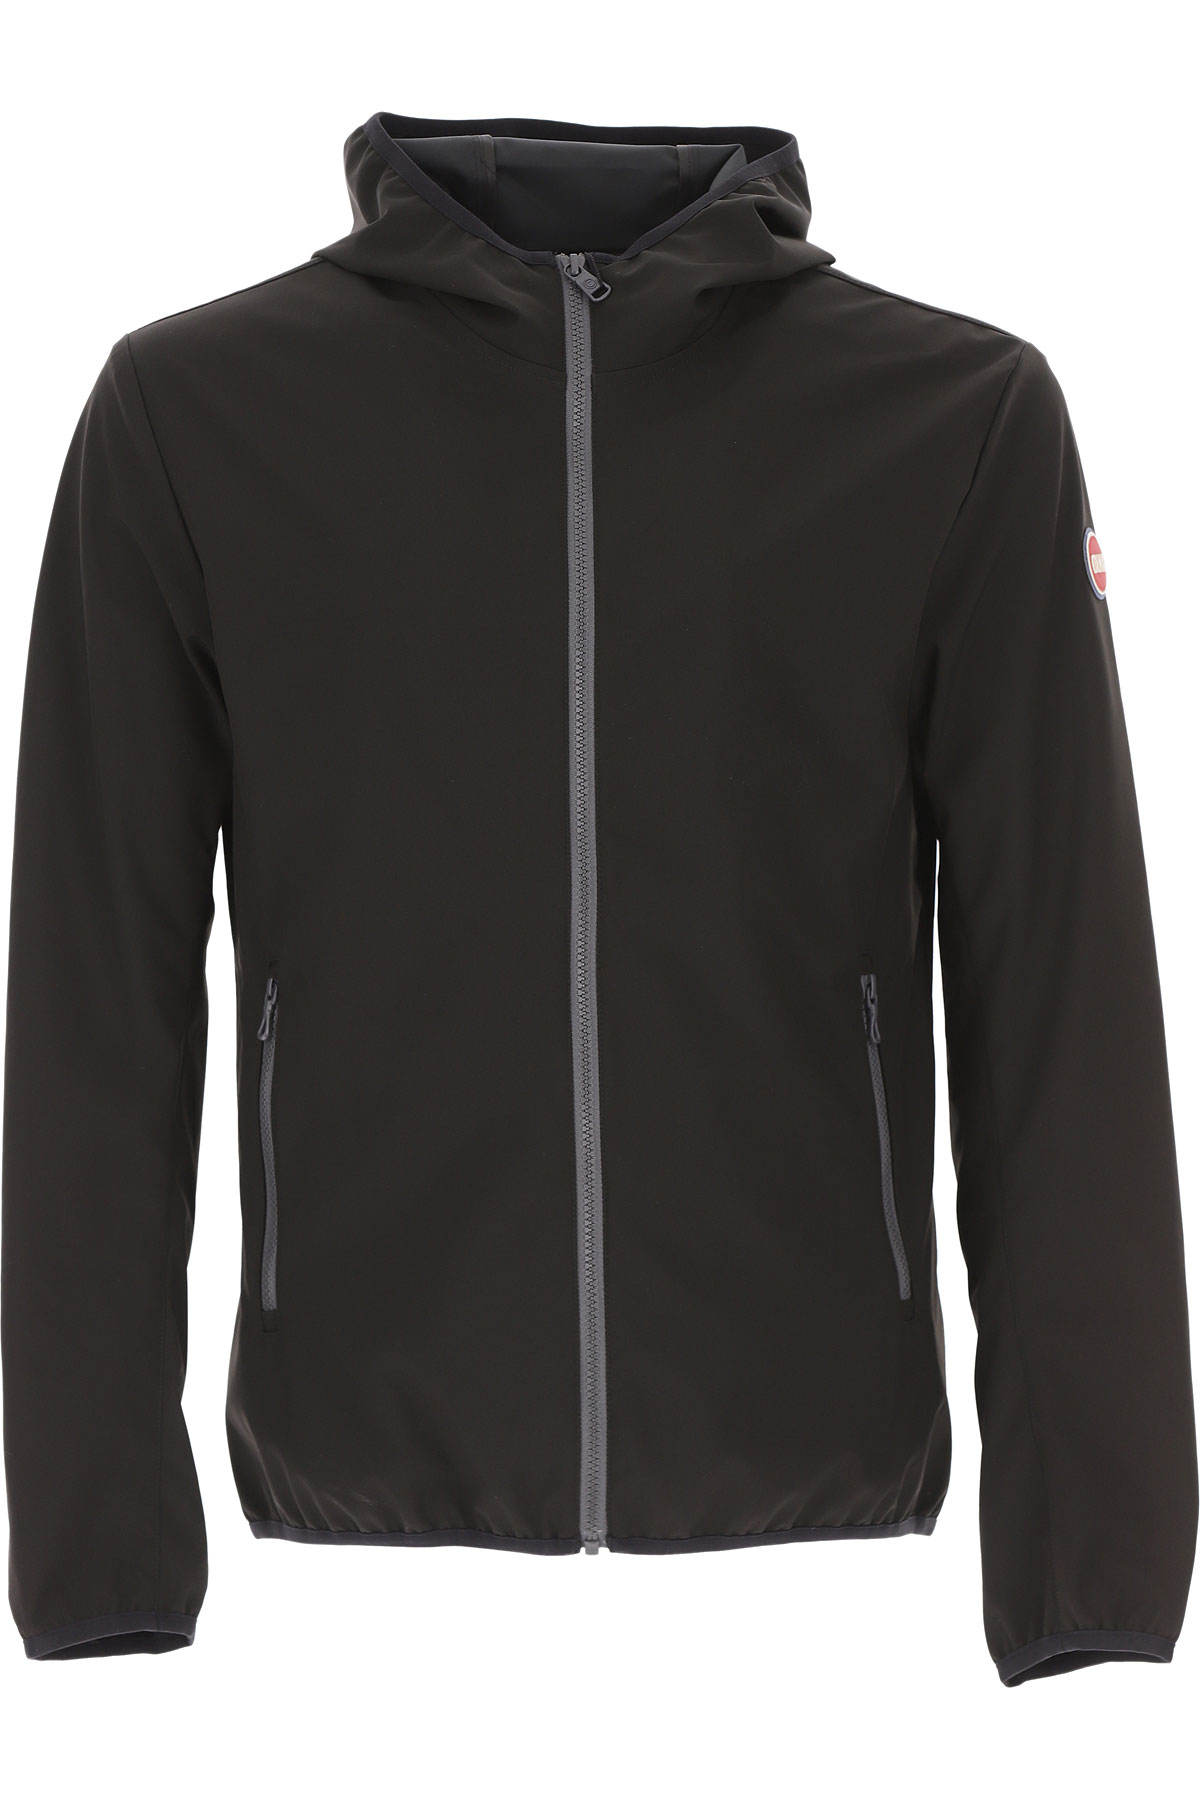 Colmar Jacket for Men On Sale, Black, polyester, 2019, L M S XL XXL XXXL